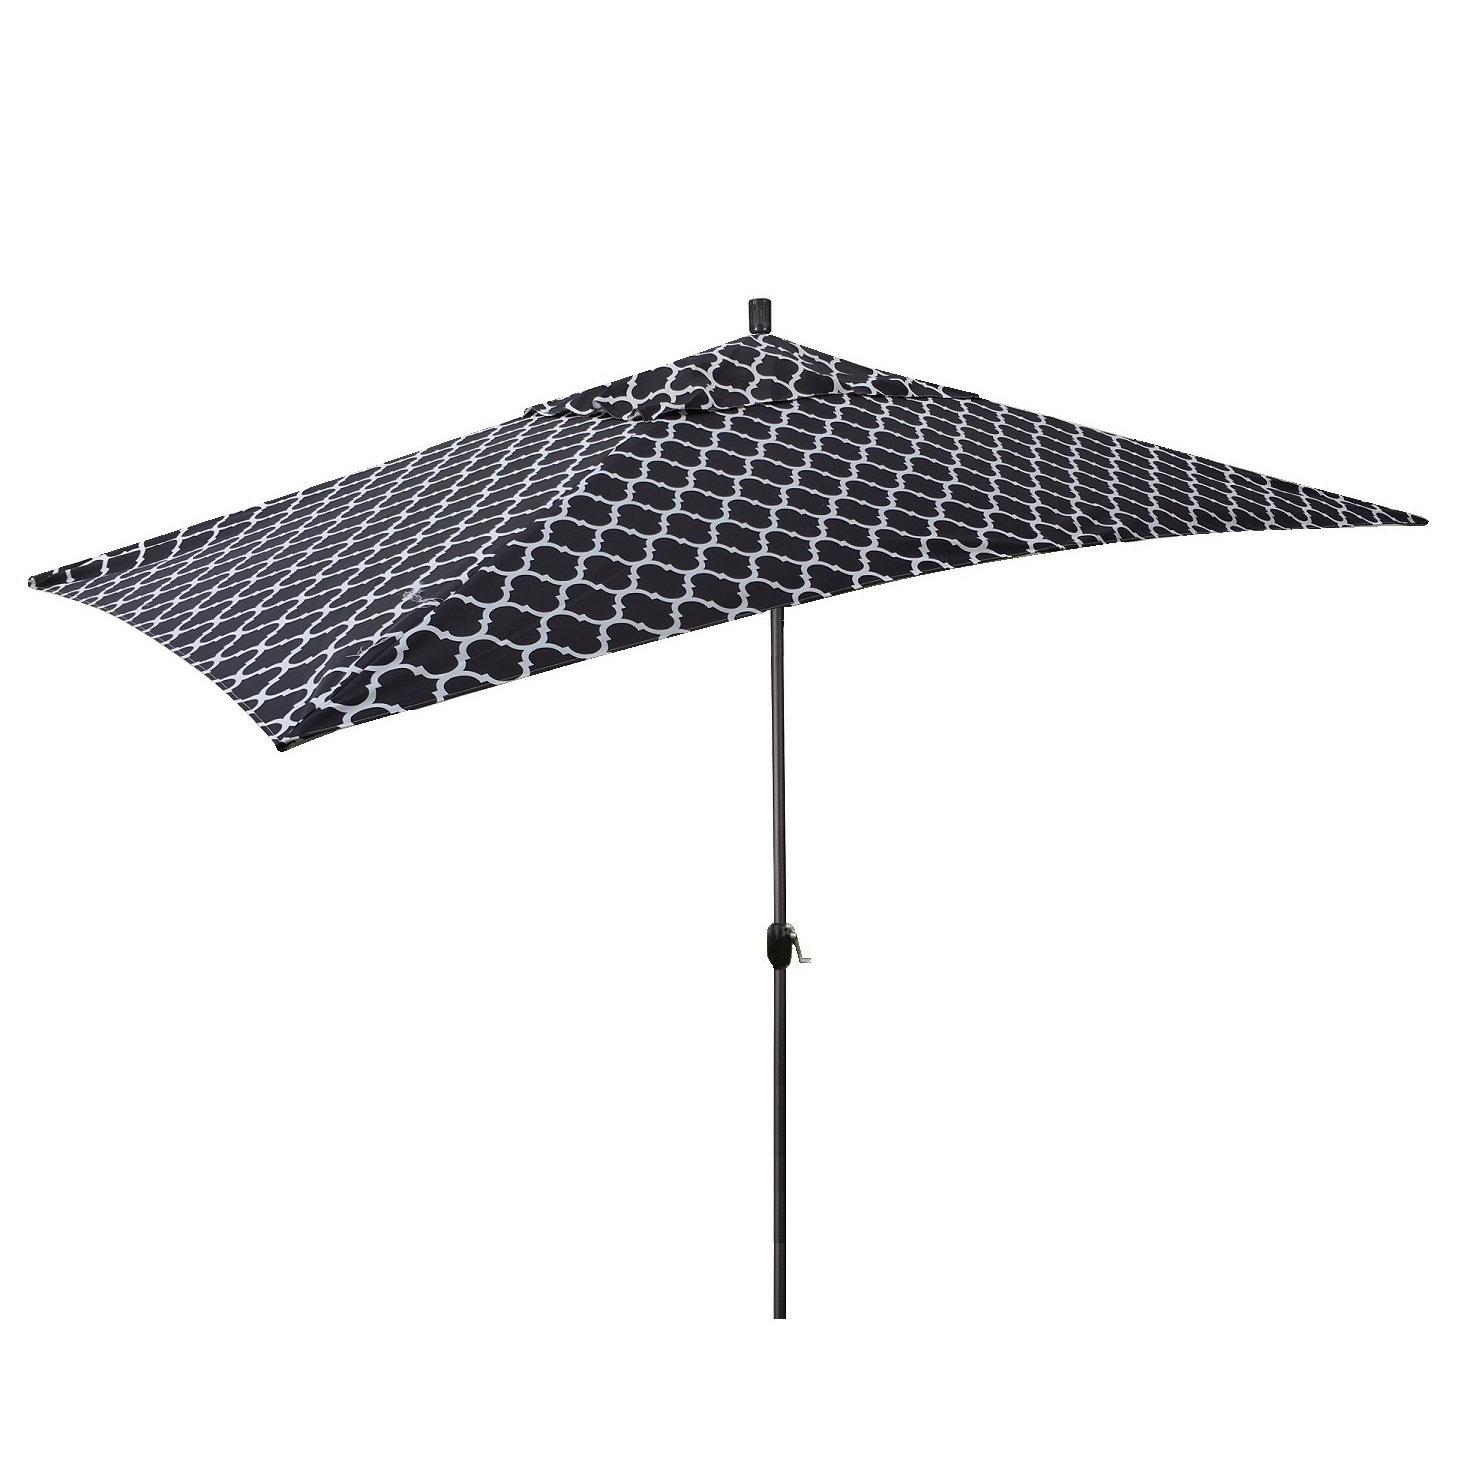 Devansh Market Umbrellas With Regard To Recent Sherlyn 10' X 6' Rectangular Market Umbrella (View 12 of 20)